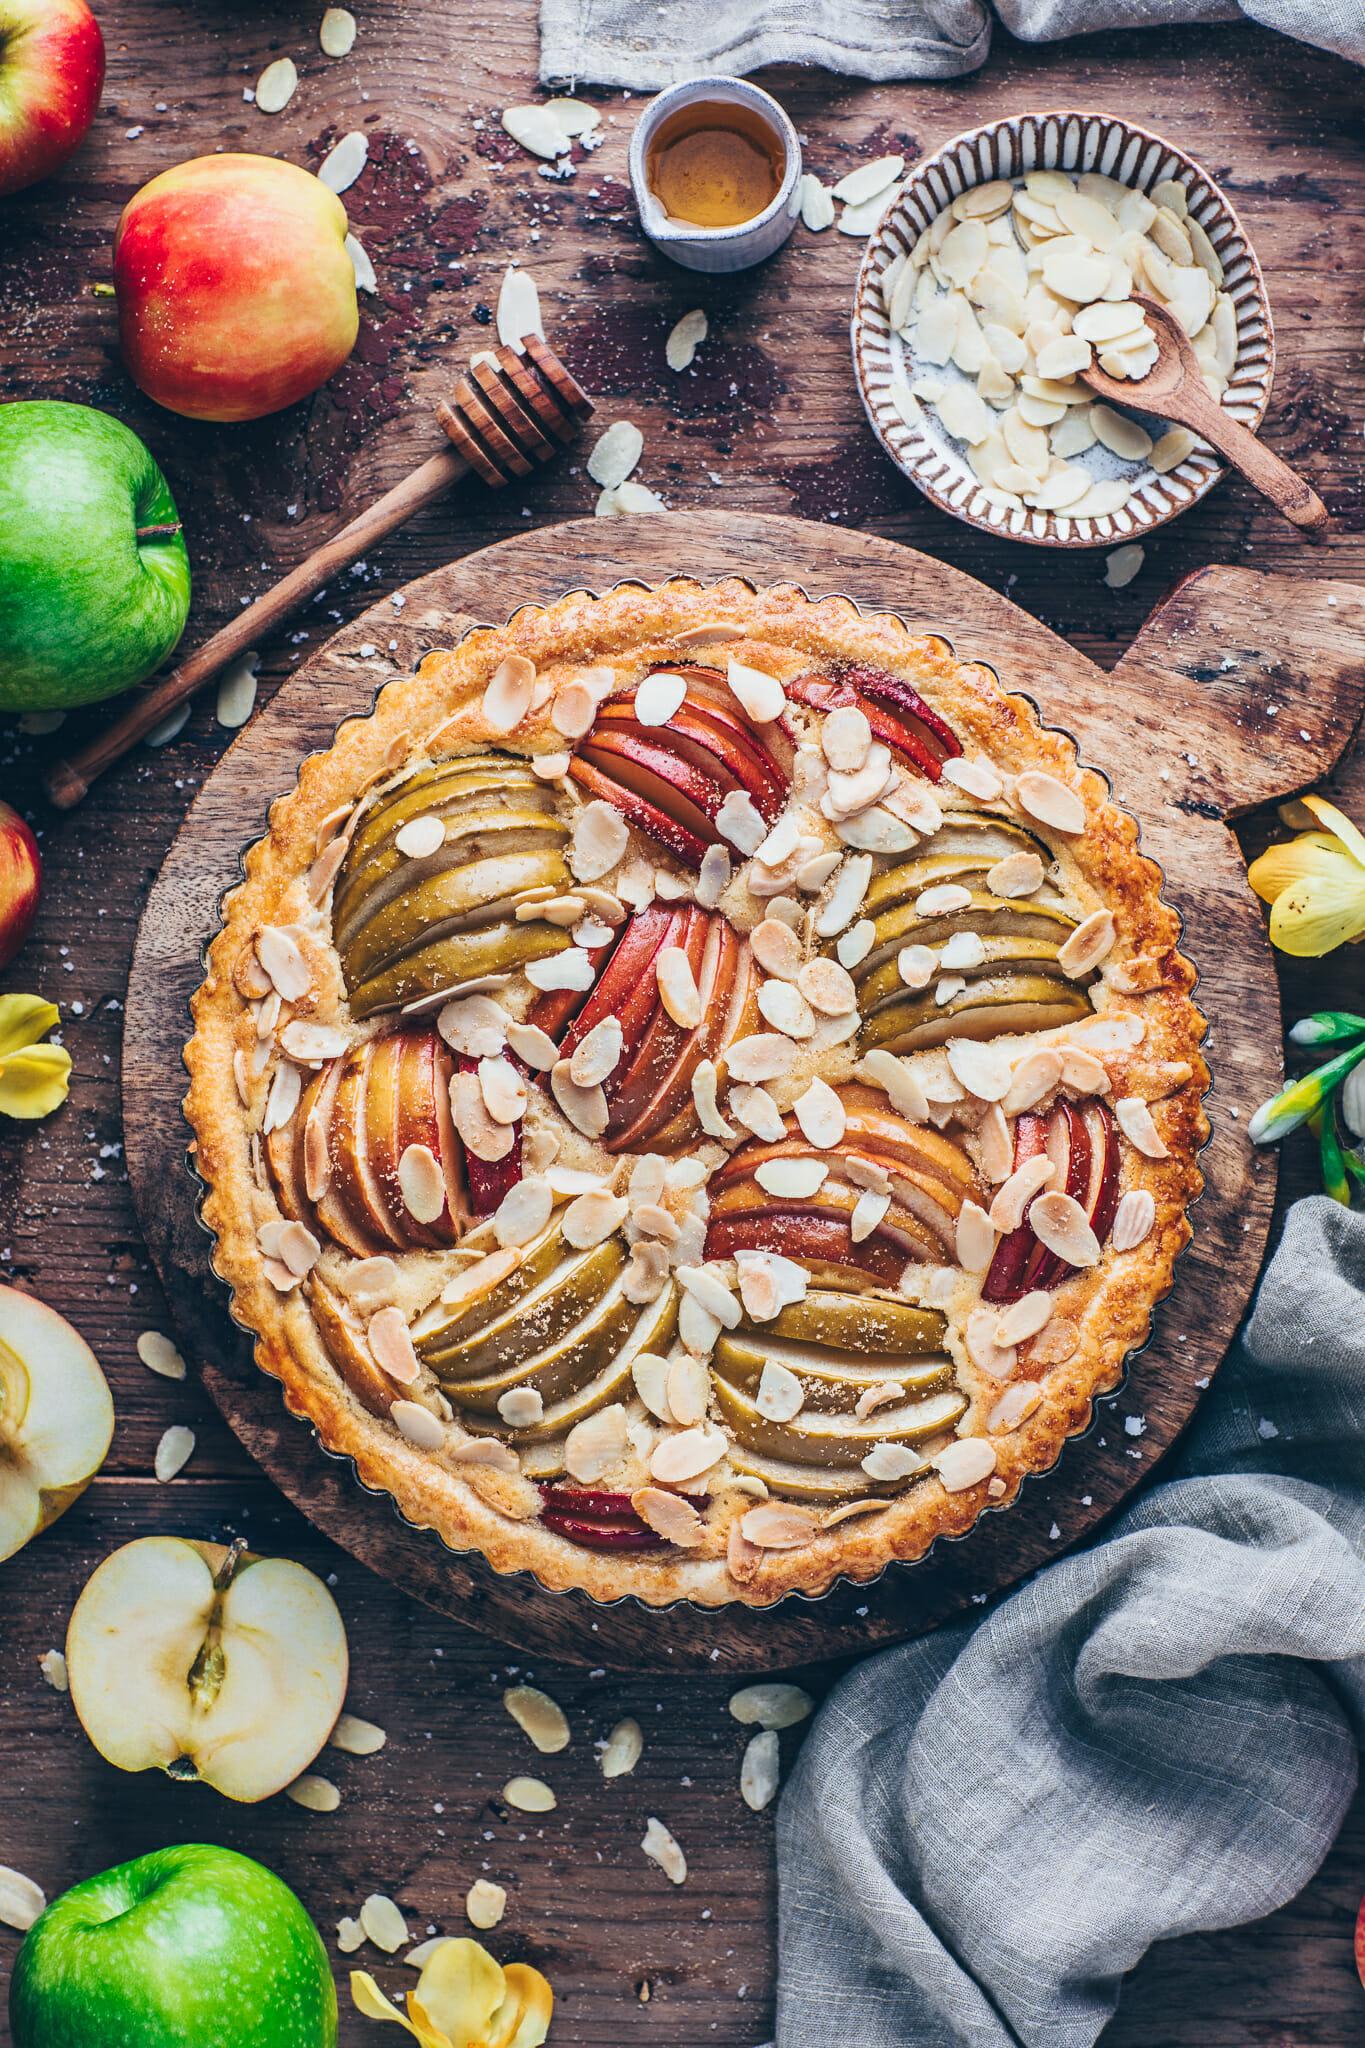 Apple Frangipane Tart (food photography)